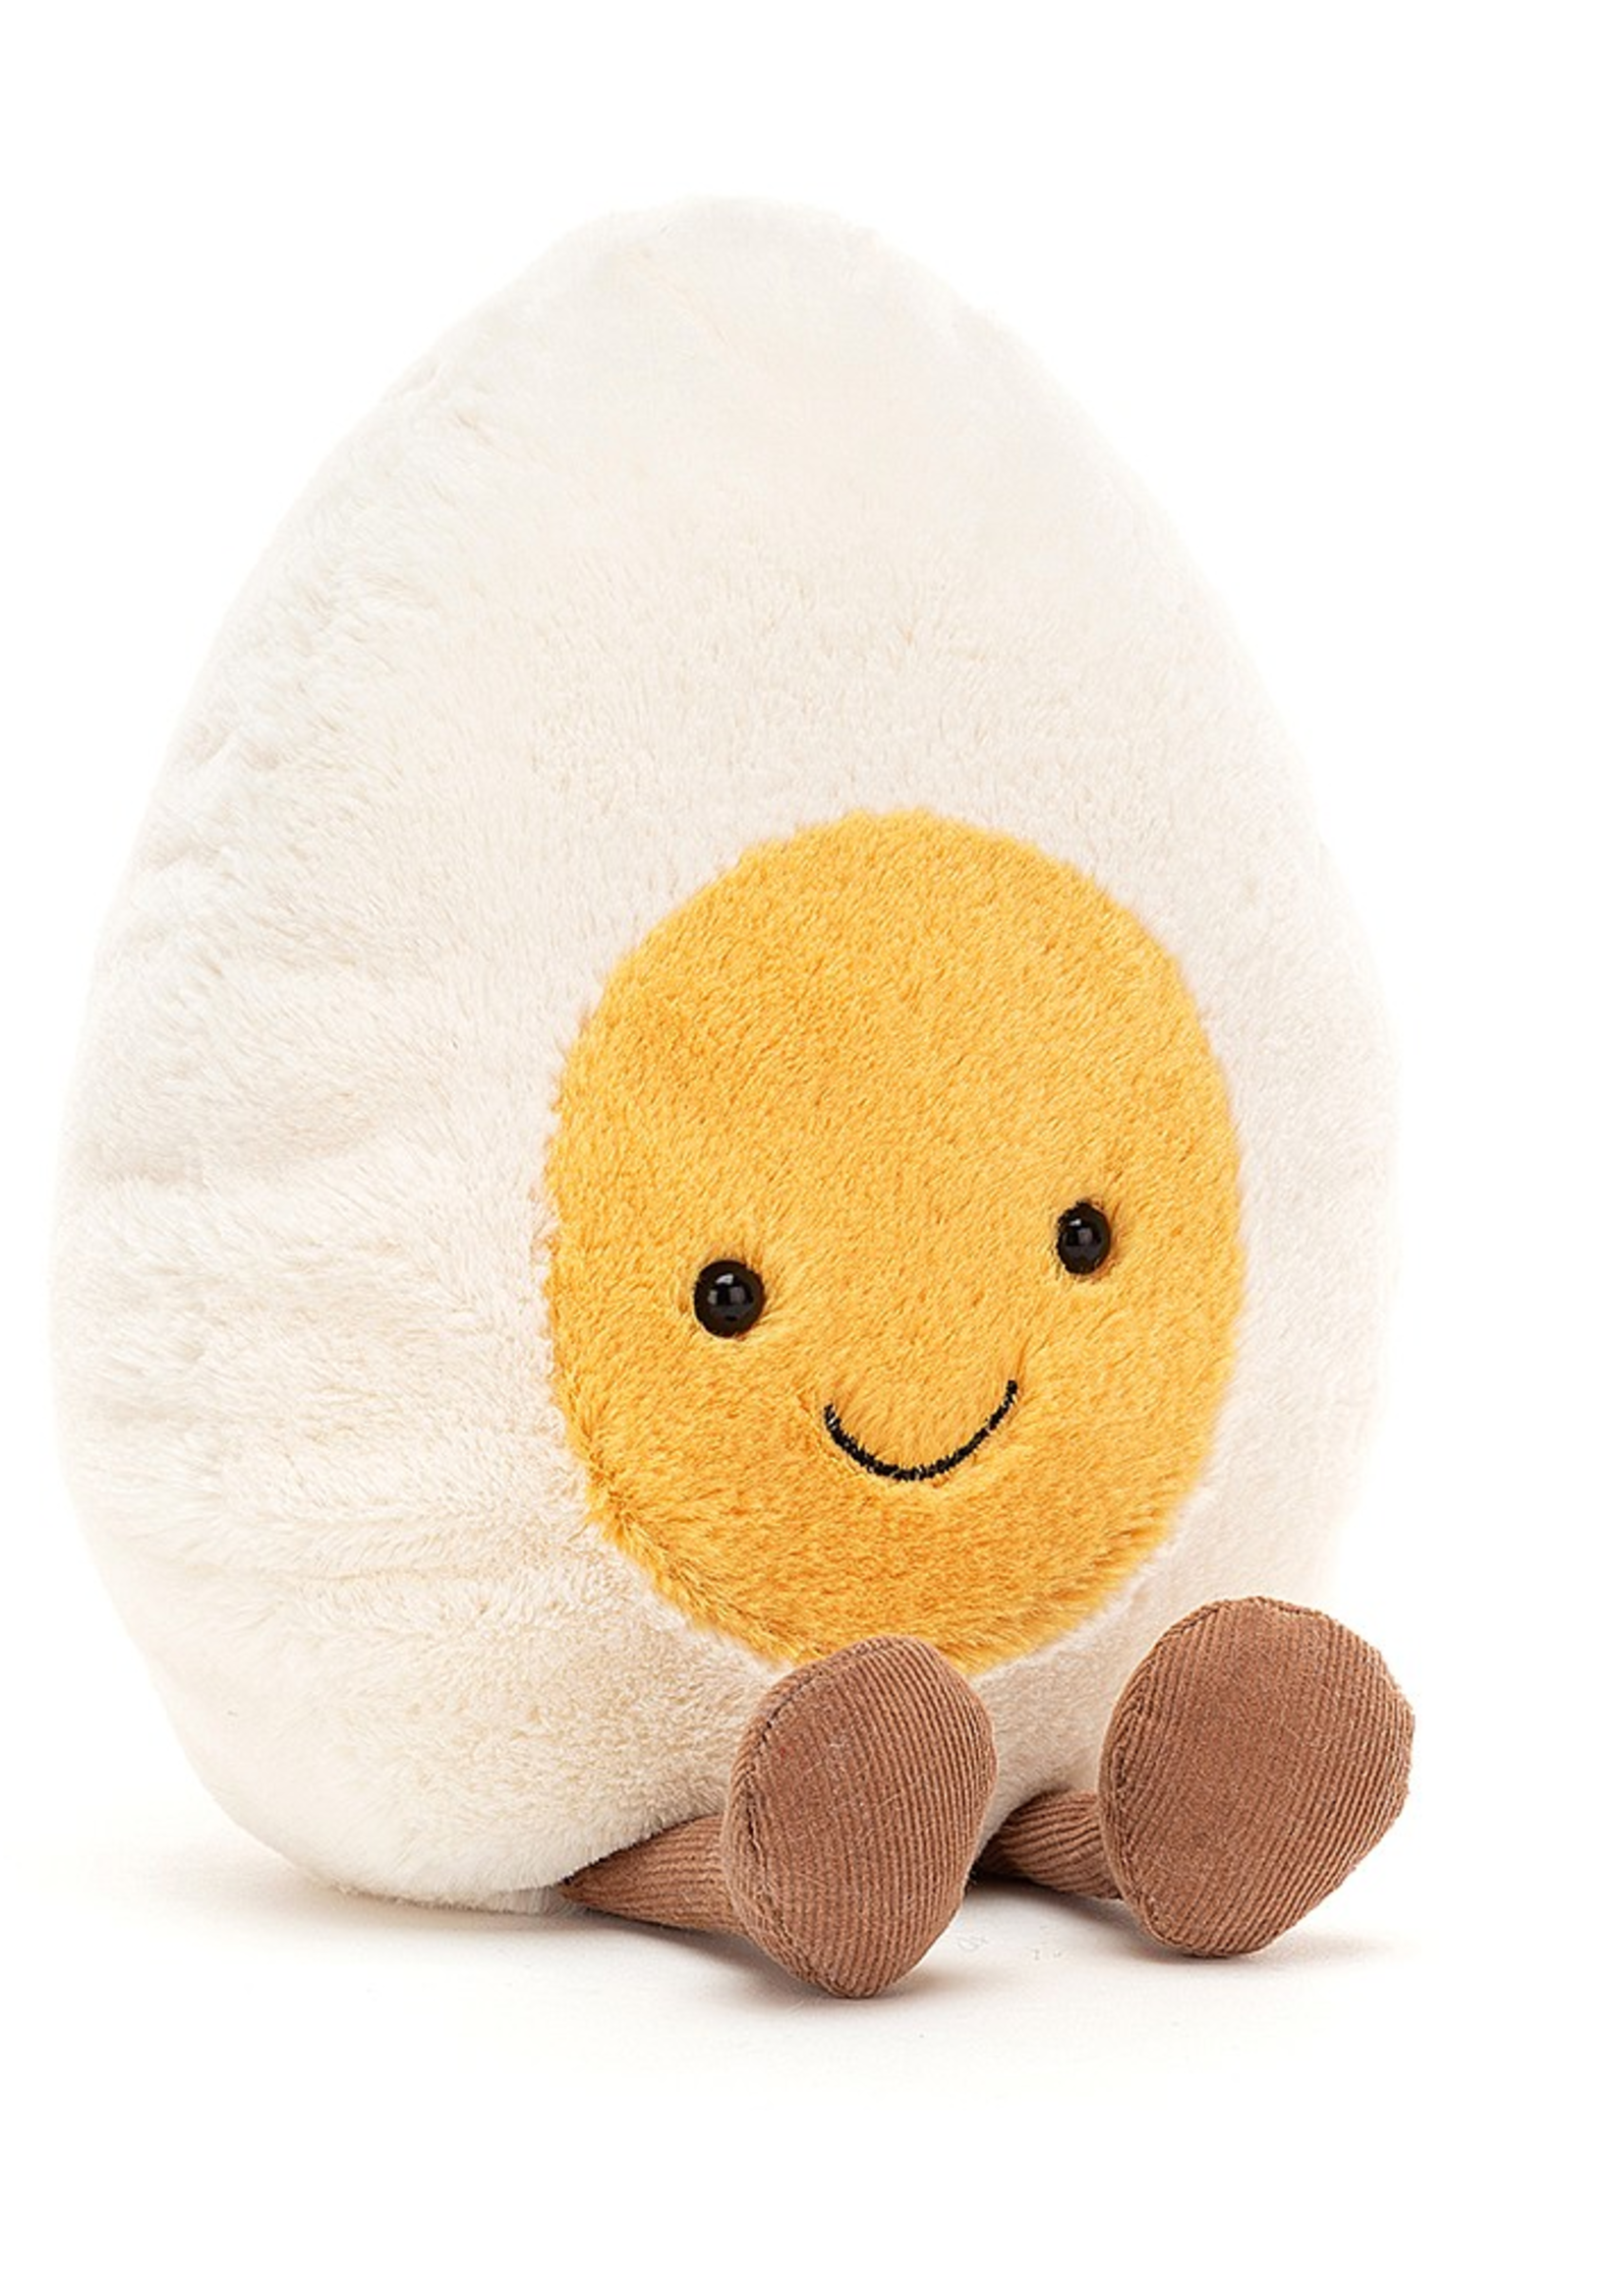 Jellycat JC Large Amuseable Boiled Egg